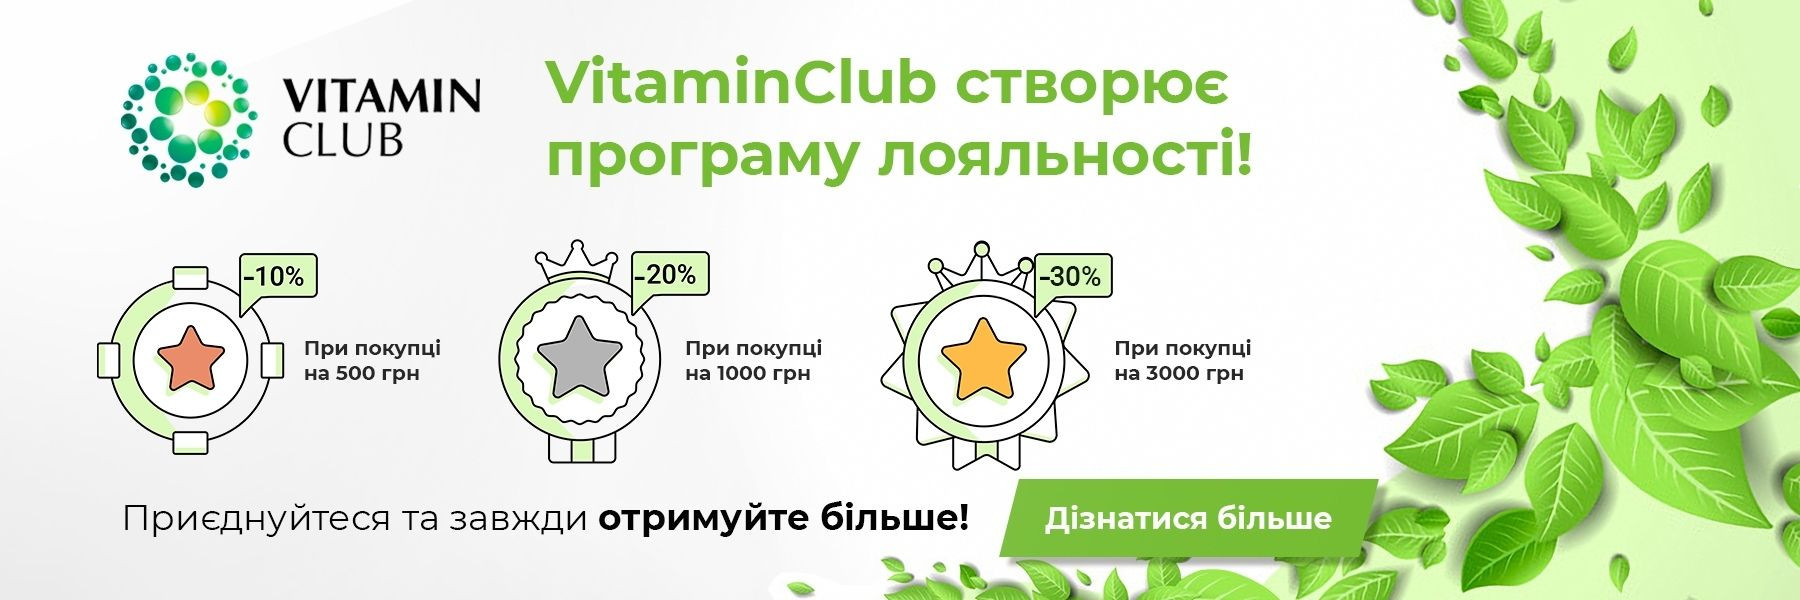 . - фото на Vitaminclub